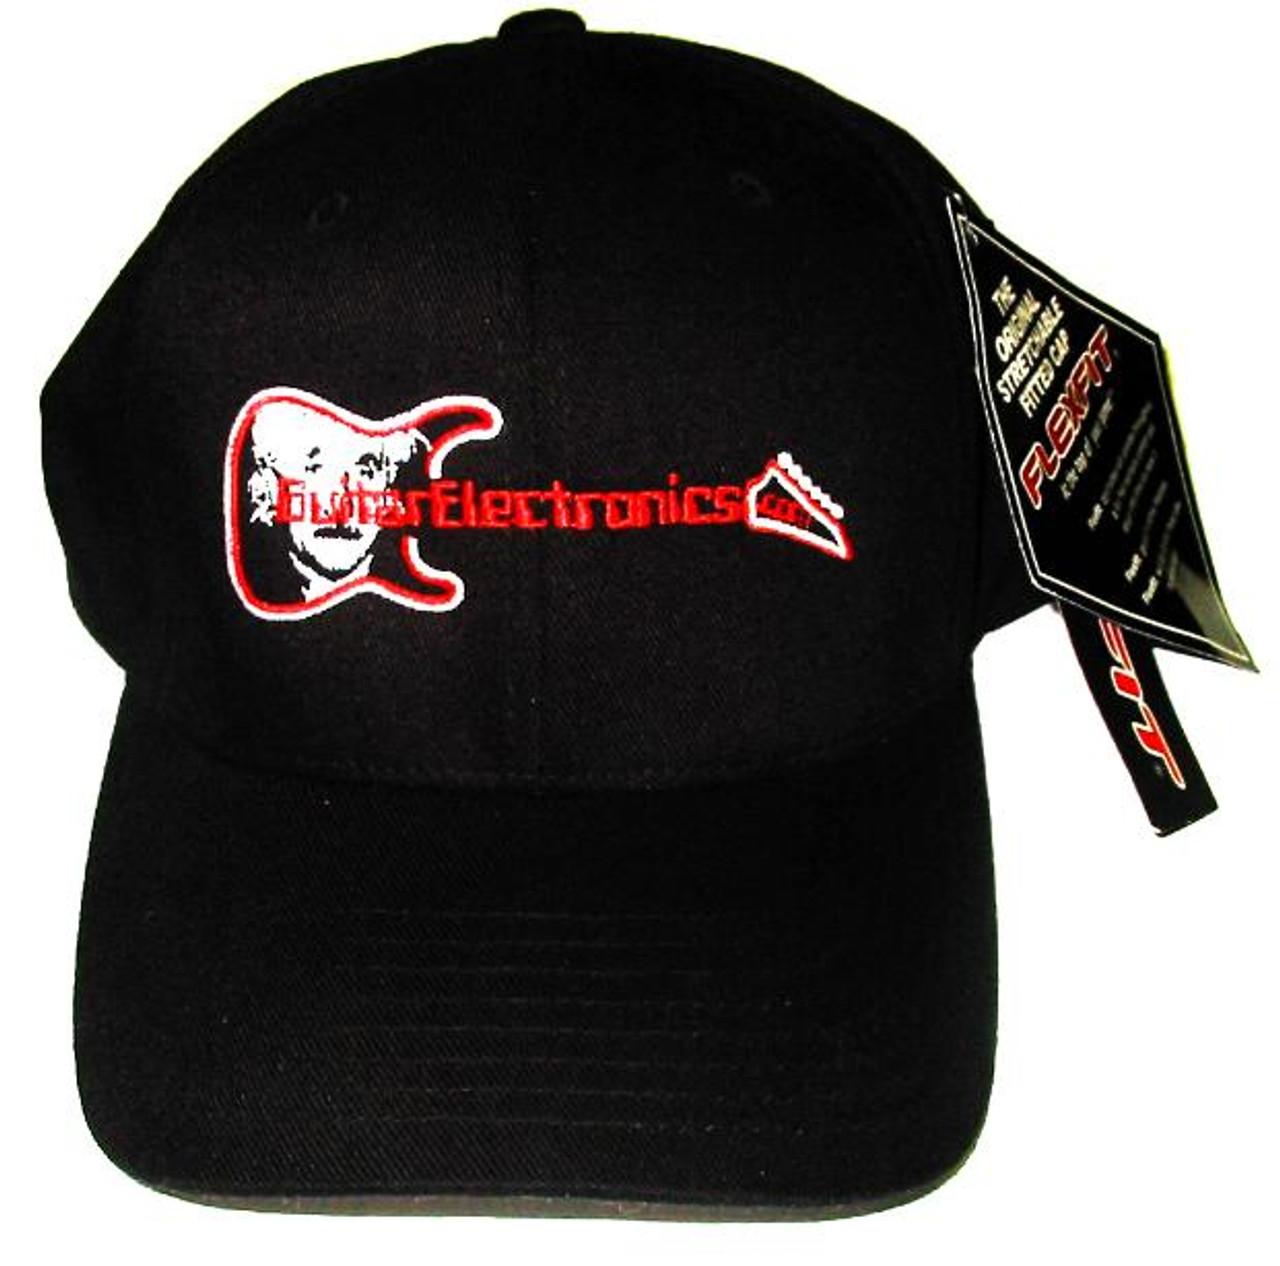 Guitar Electronics Logo Flexfit Hat